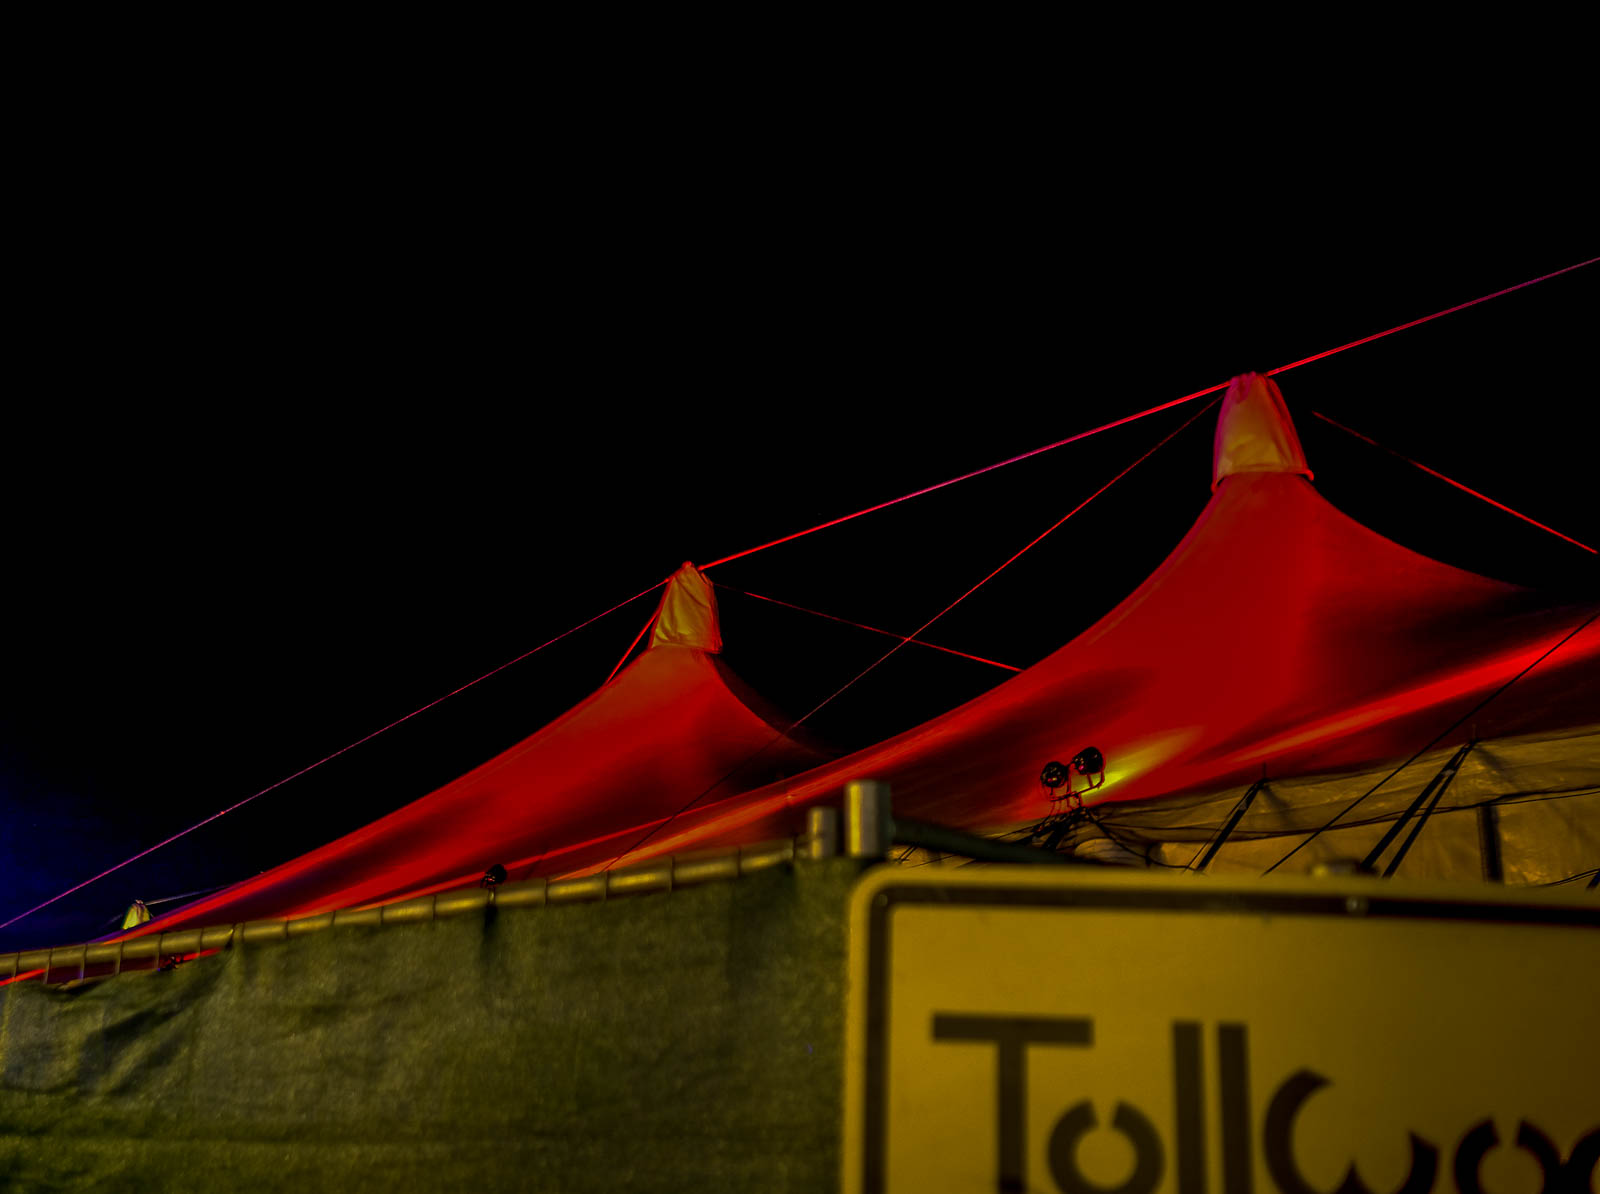 tollwood-31.jpg